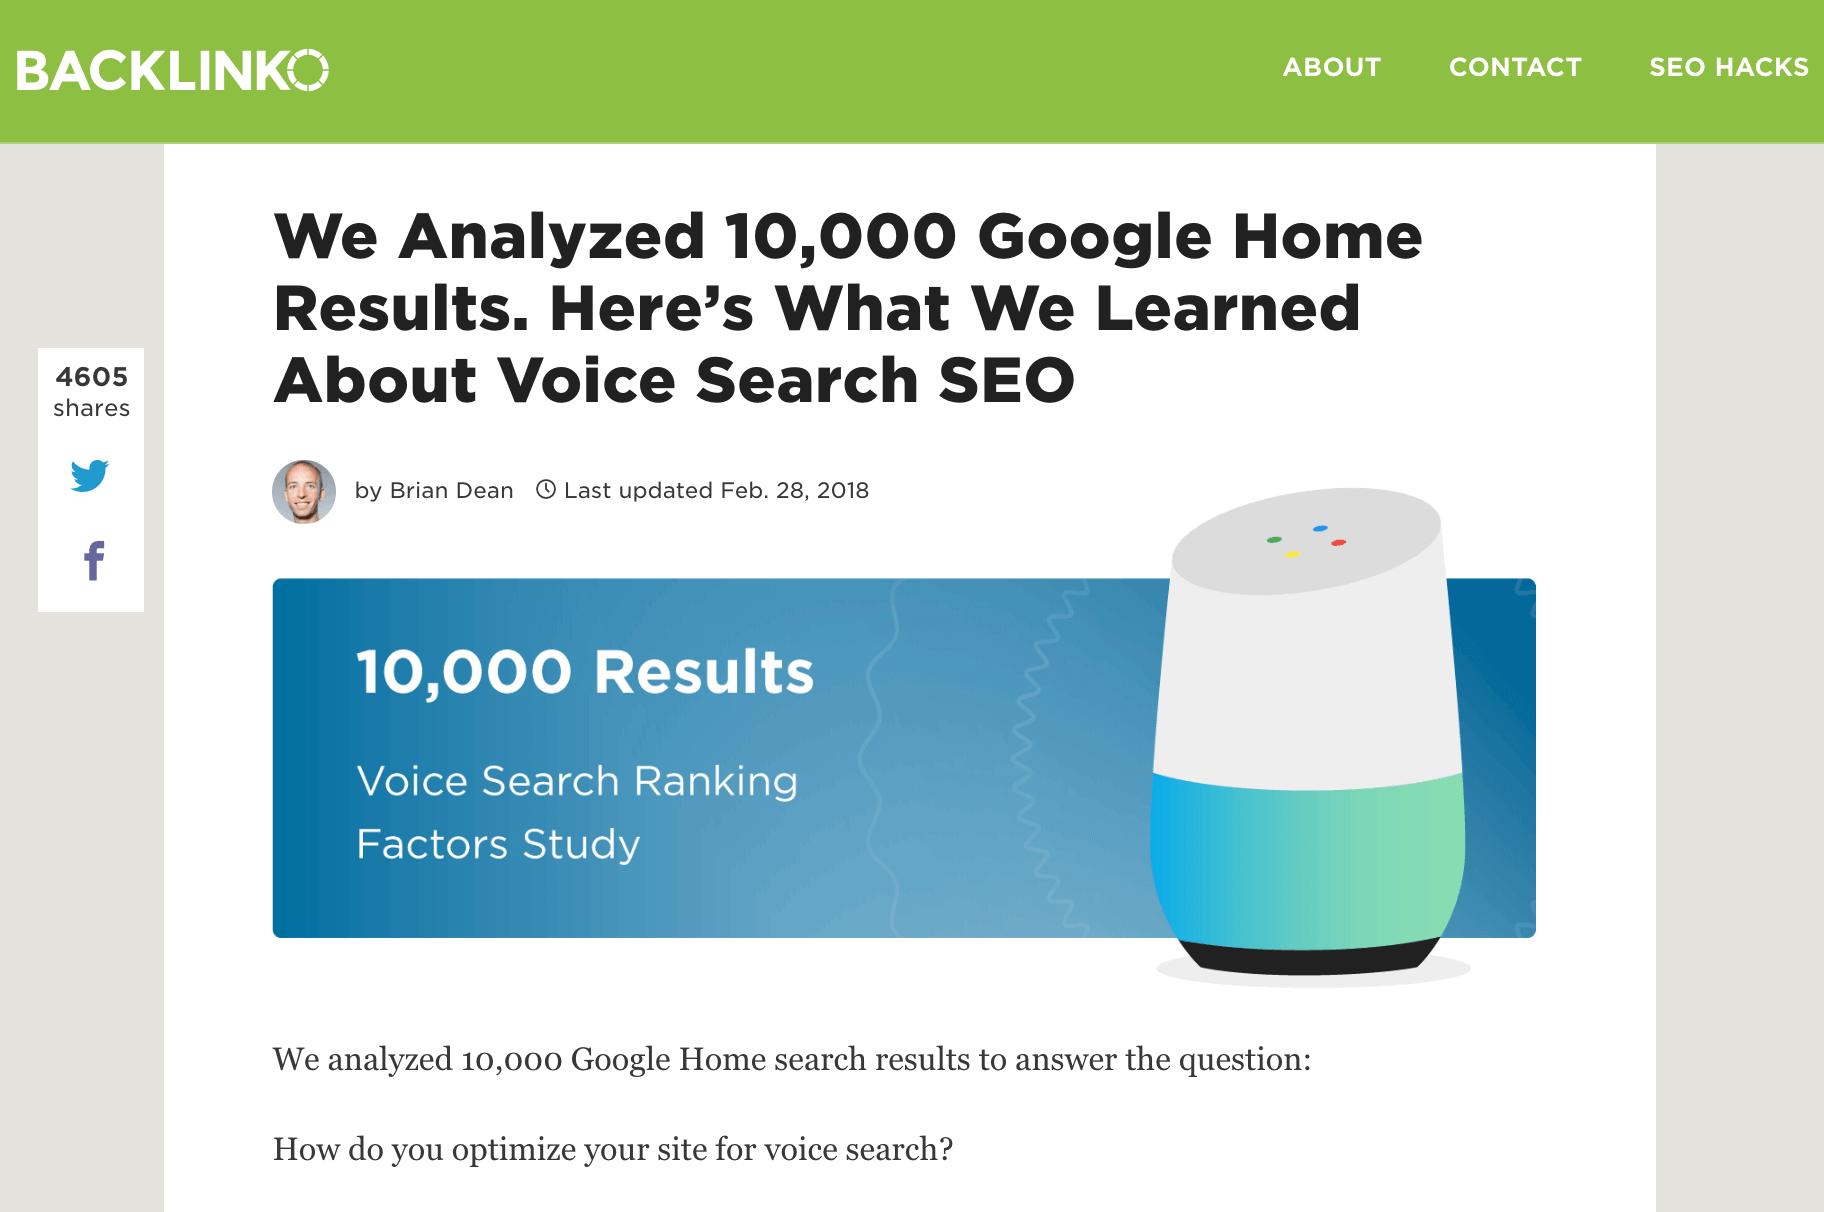 Voice Search SEO Study